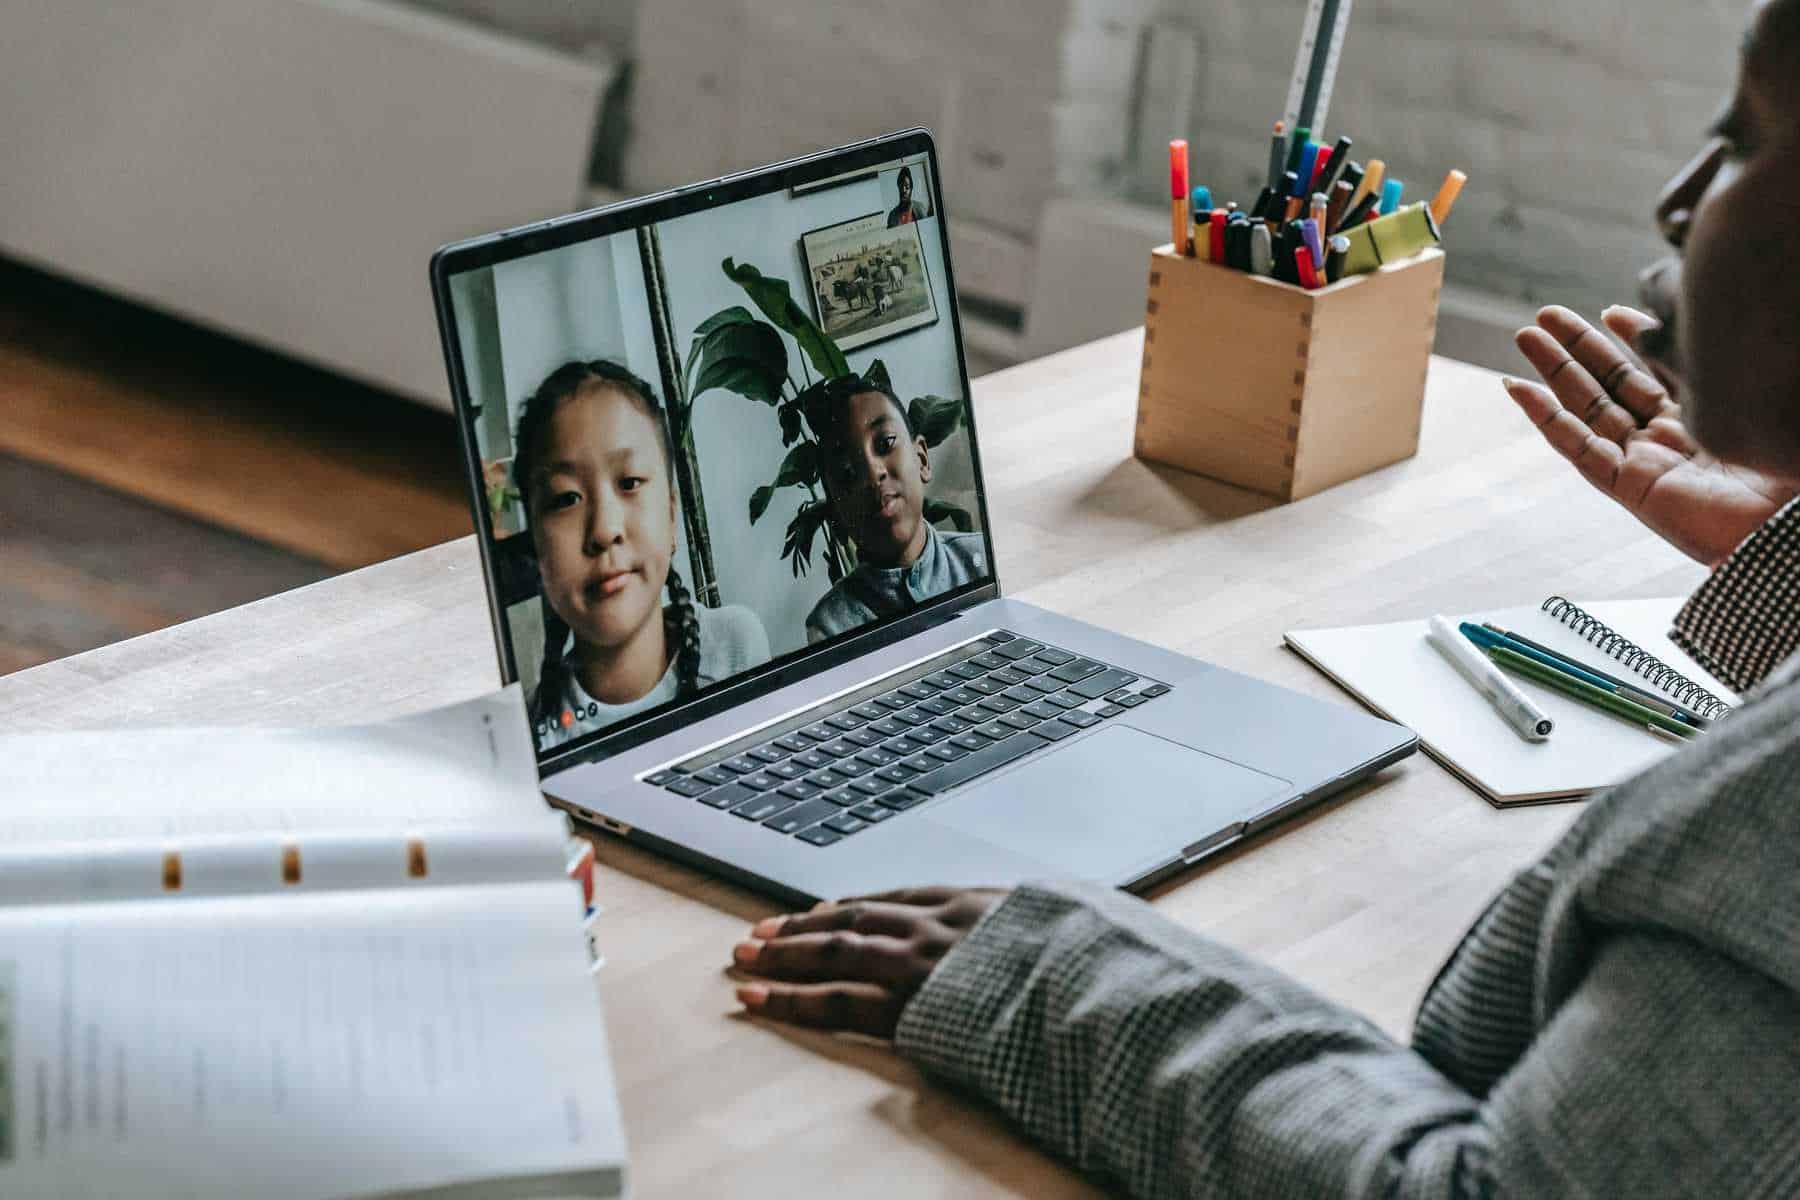 Online tutoring with Gogokid